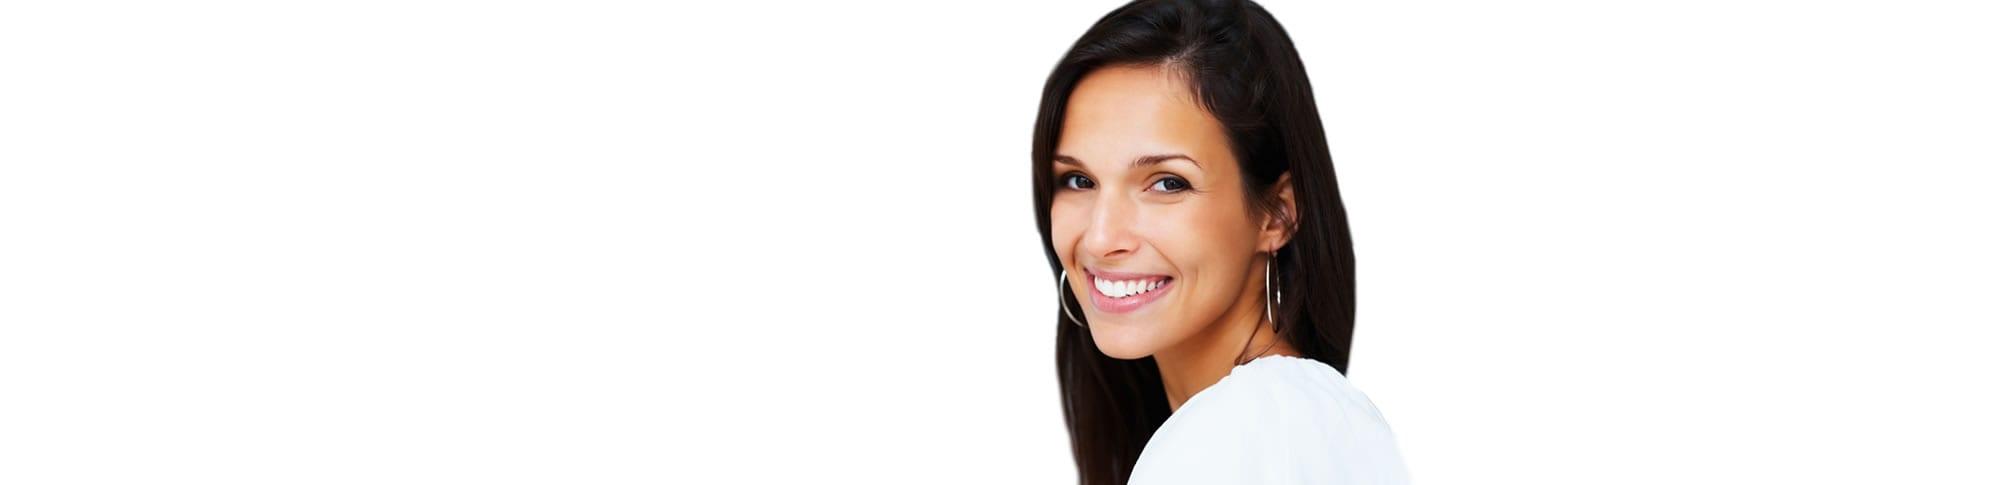 cosmetic-dentistry-aventura-1-min